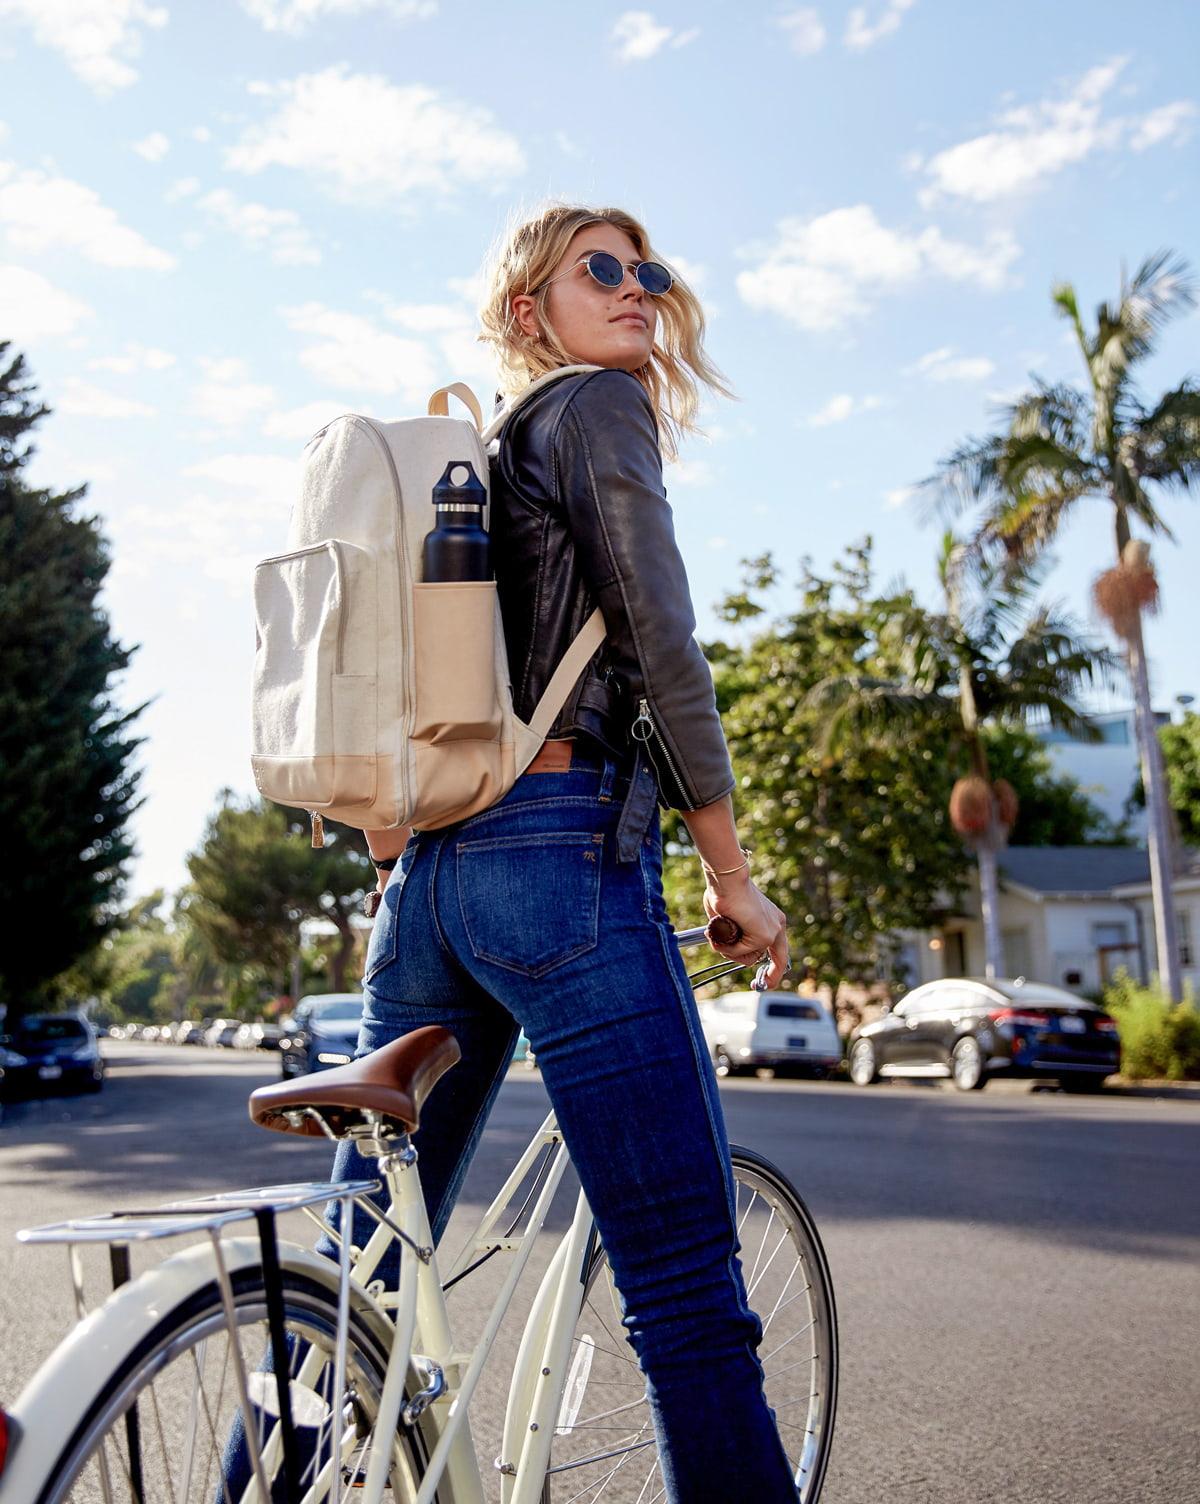 Best Commuting Backpack for Women